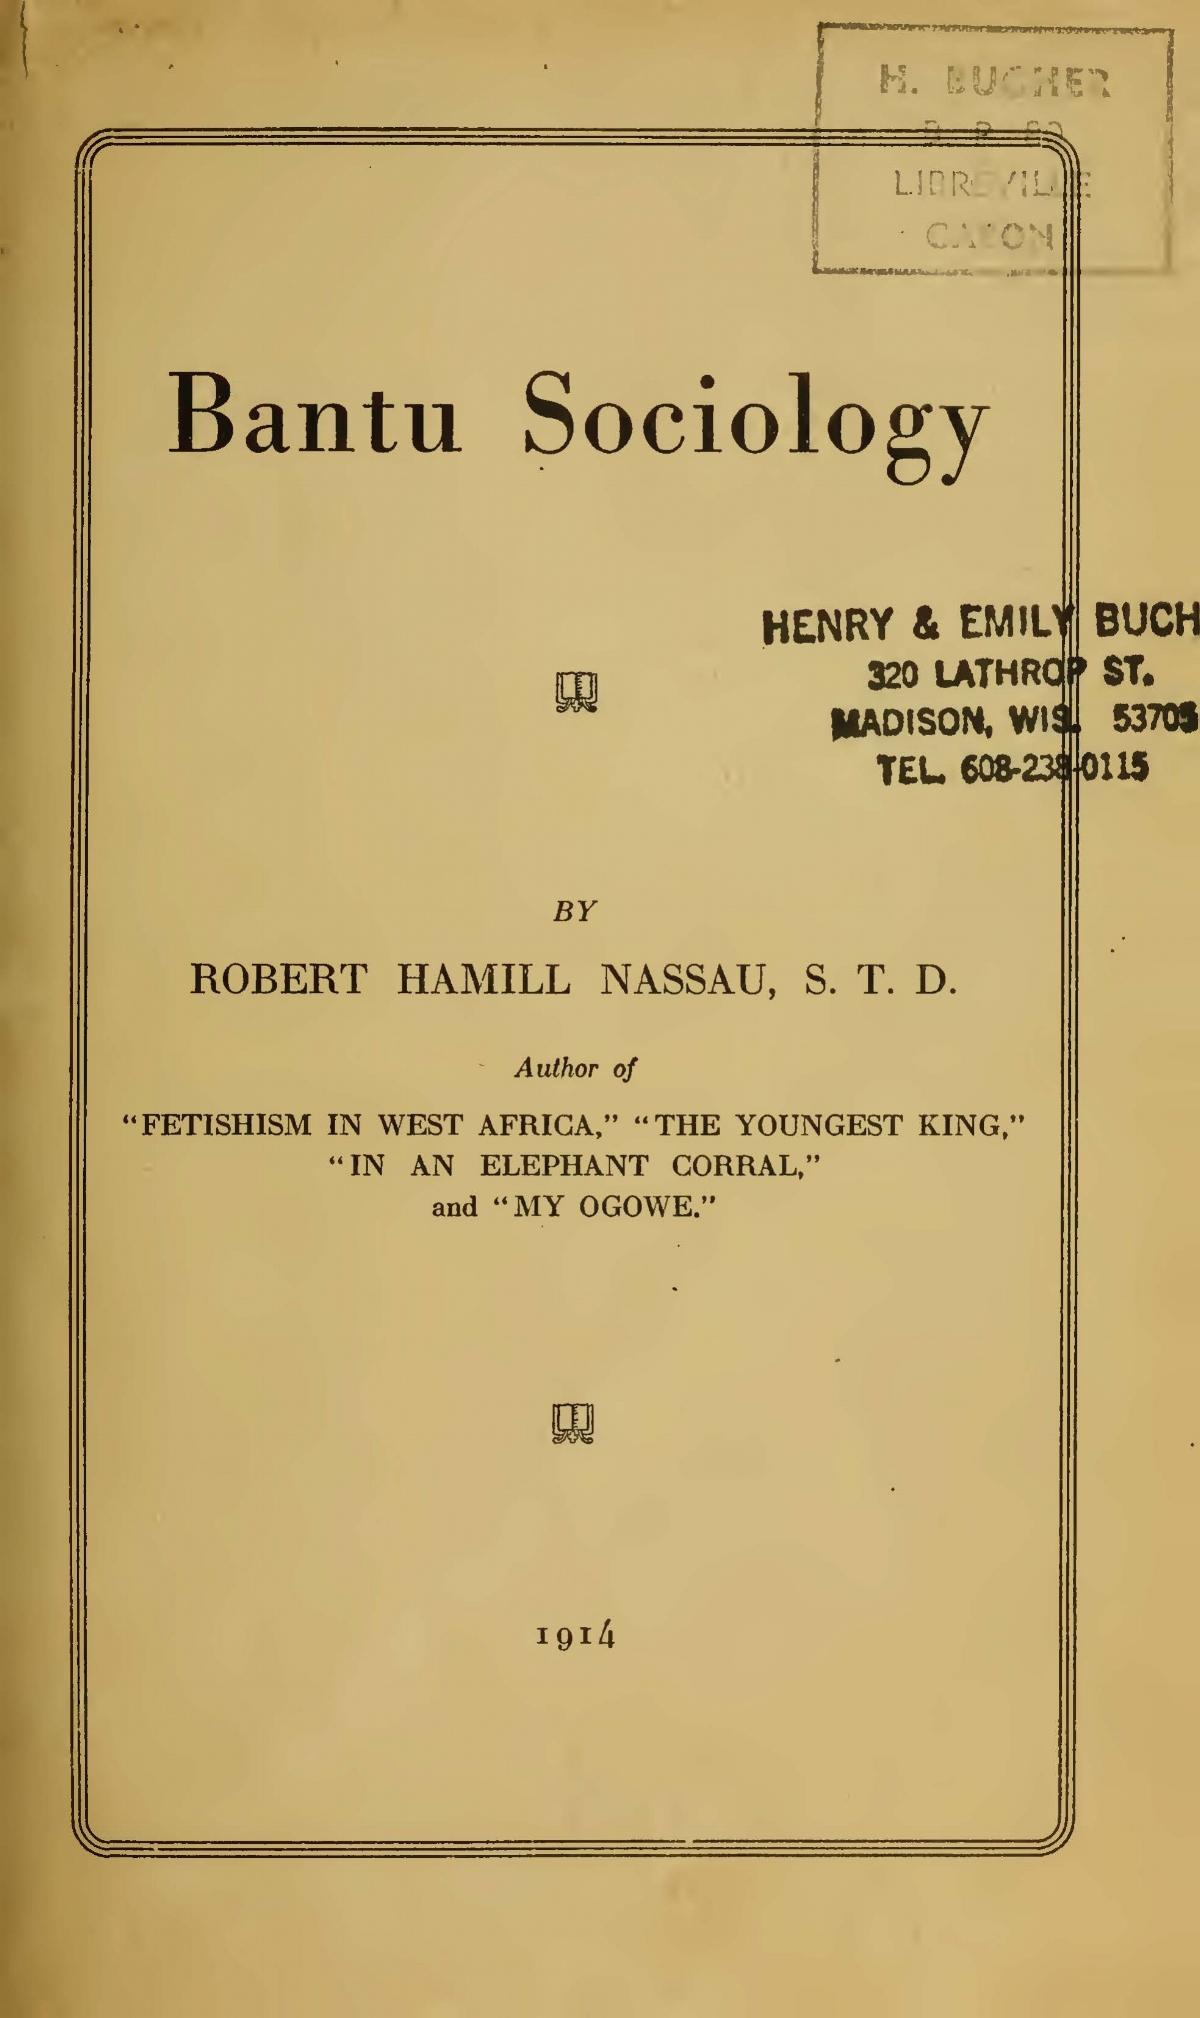 Nassau, Robert Hamill, Bantu Sociology Title Page.jpg